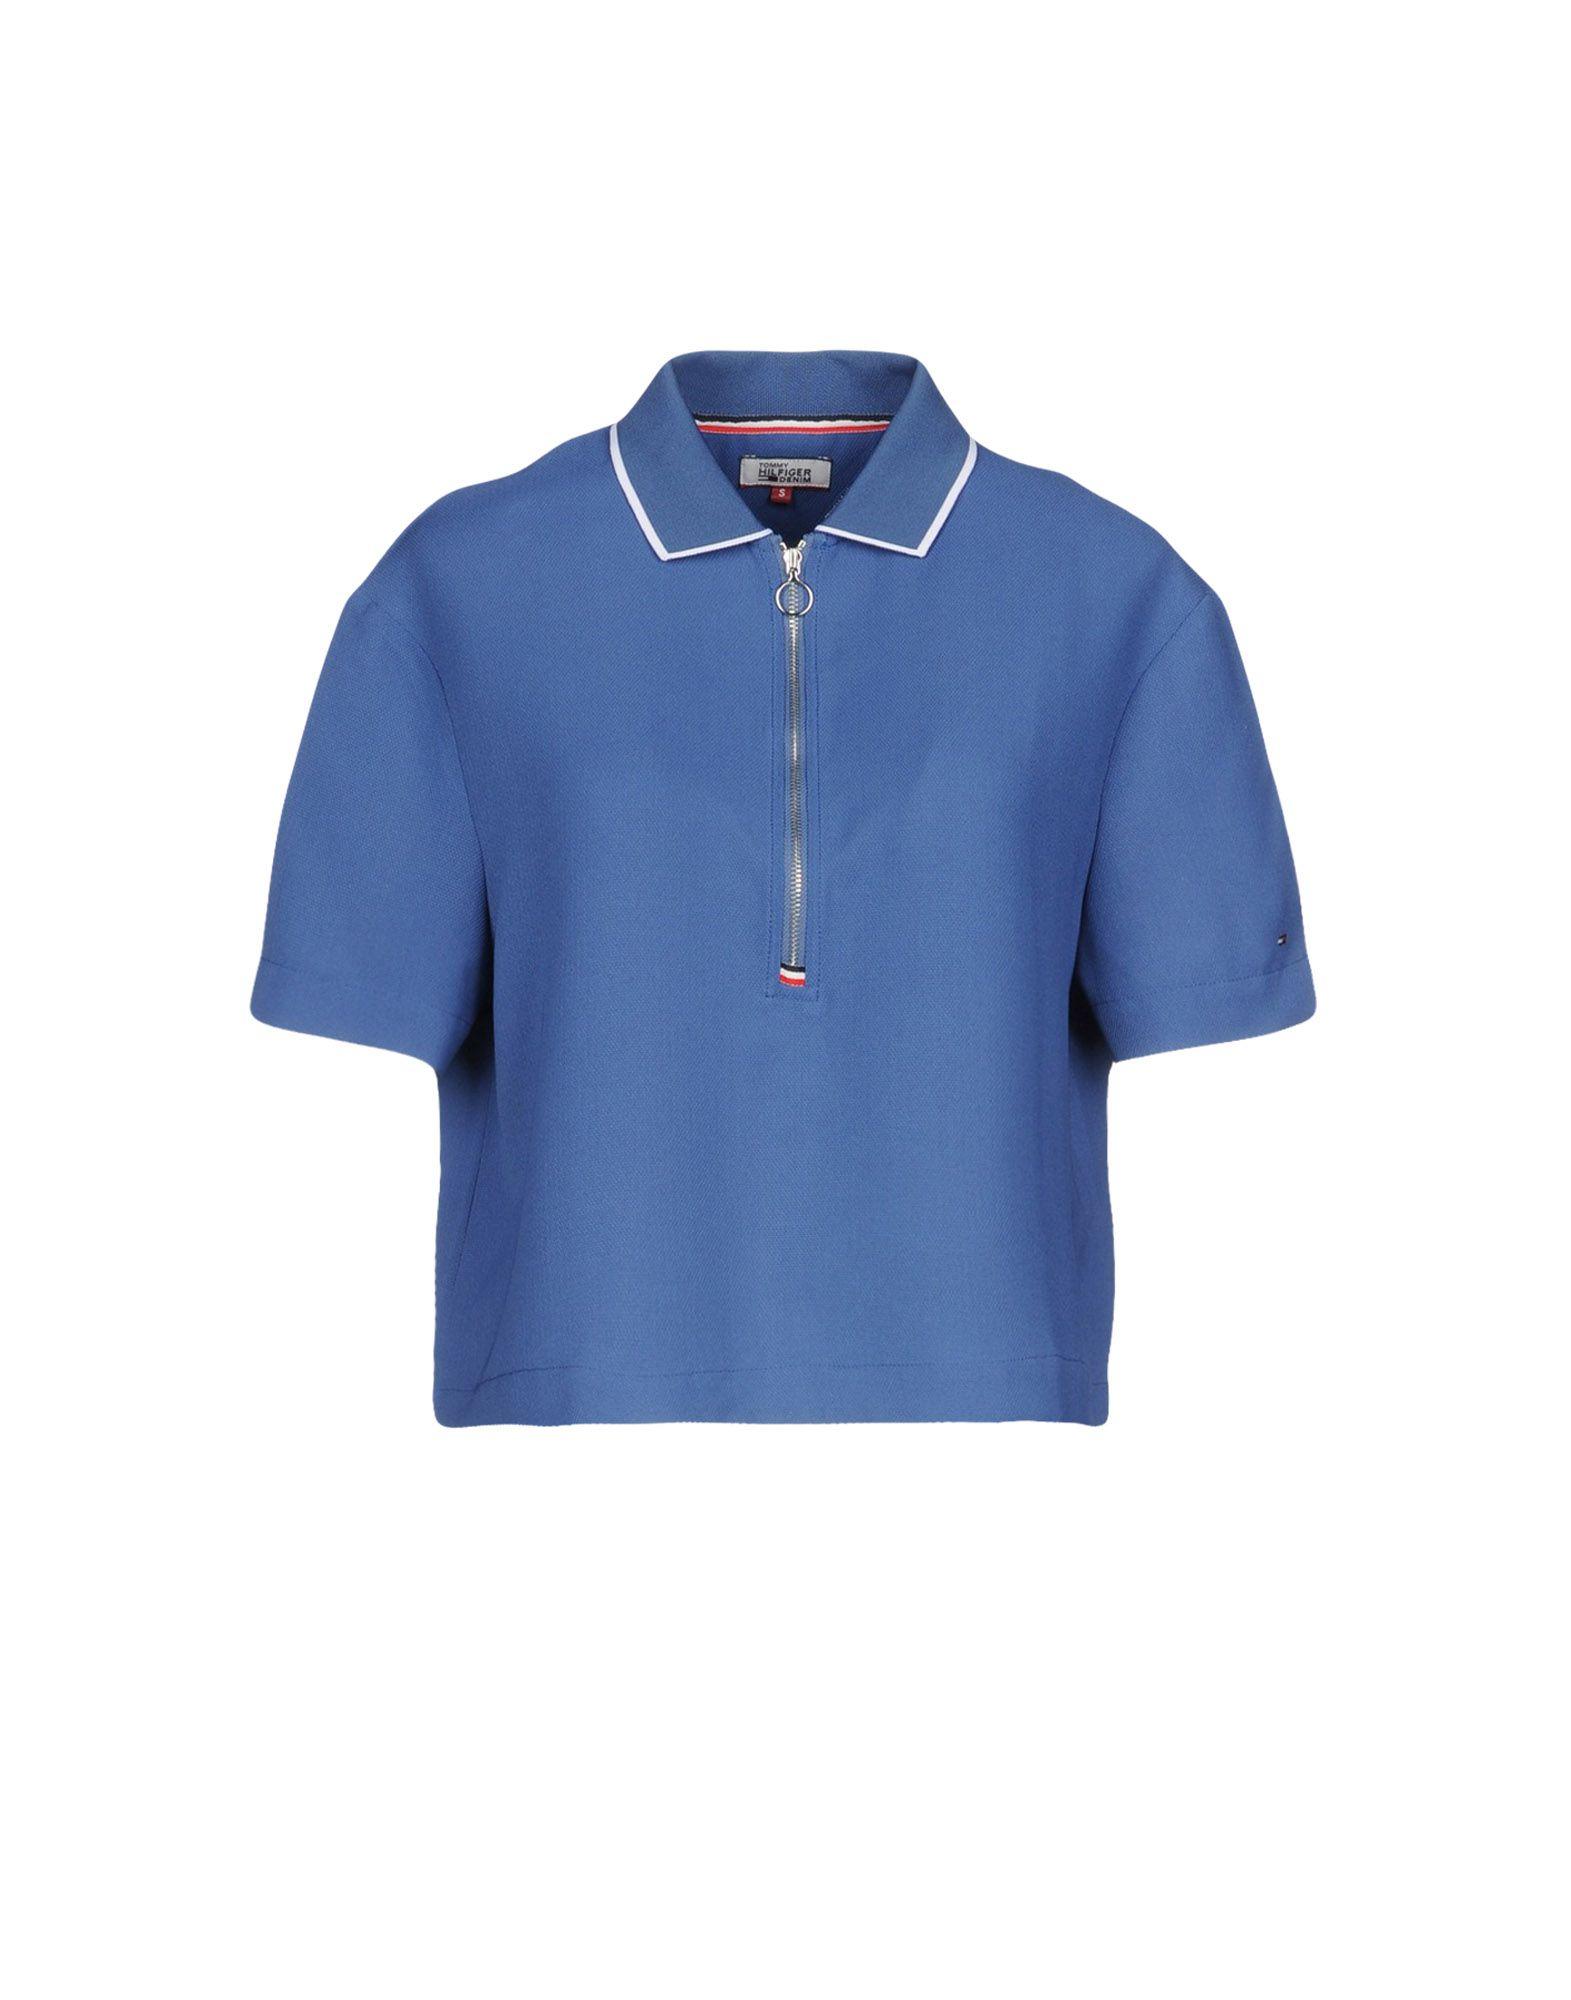 TOMMY HILFIGER DENIM Поло футболка детская tommy hilfiger polo polo